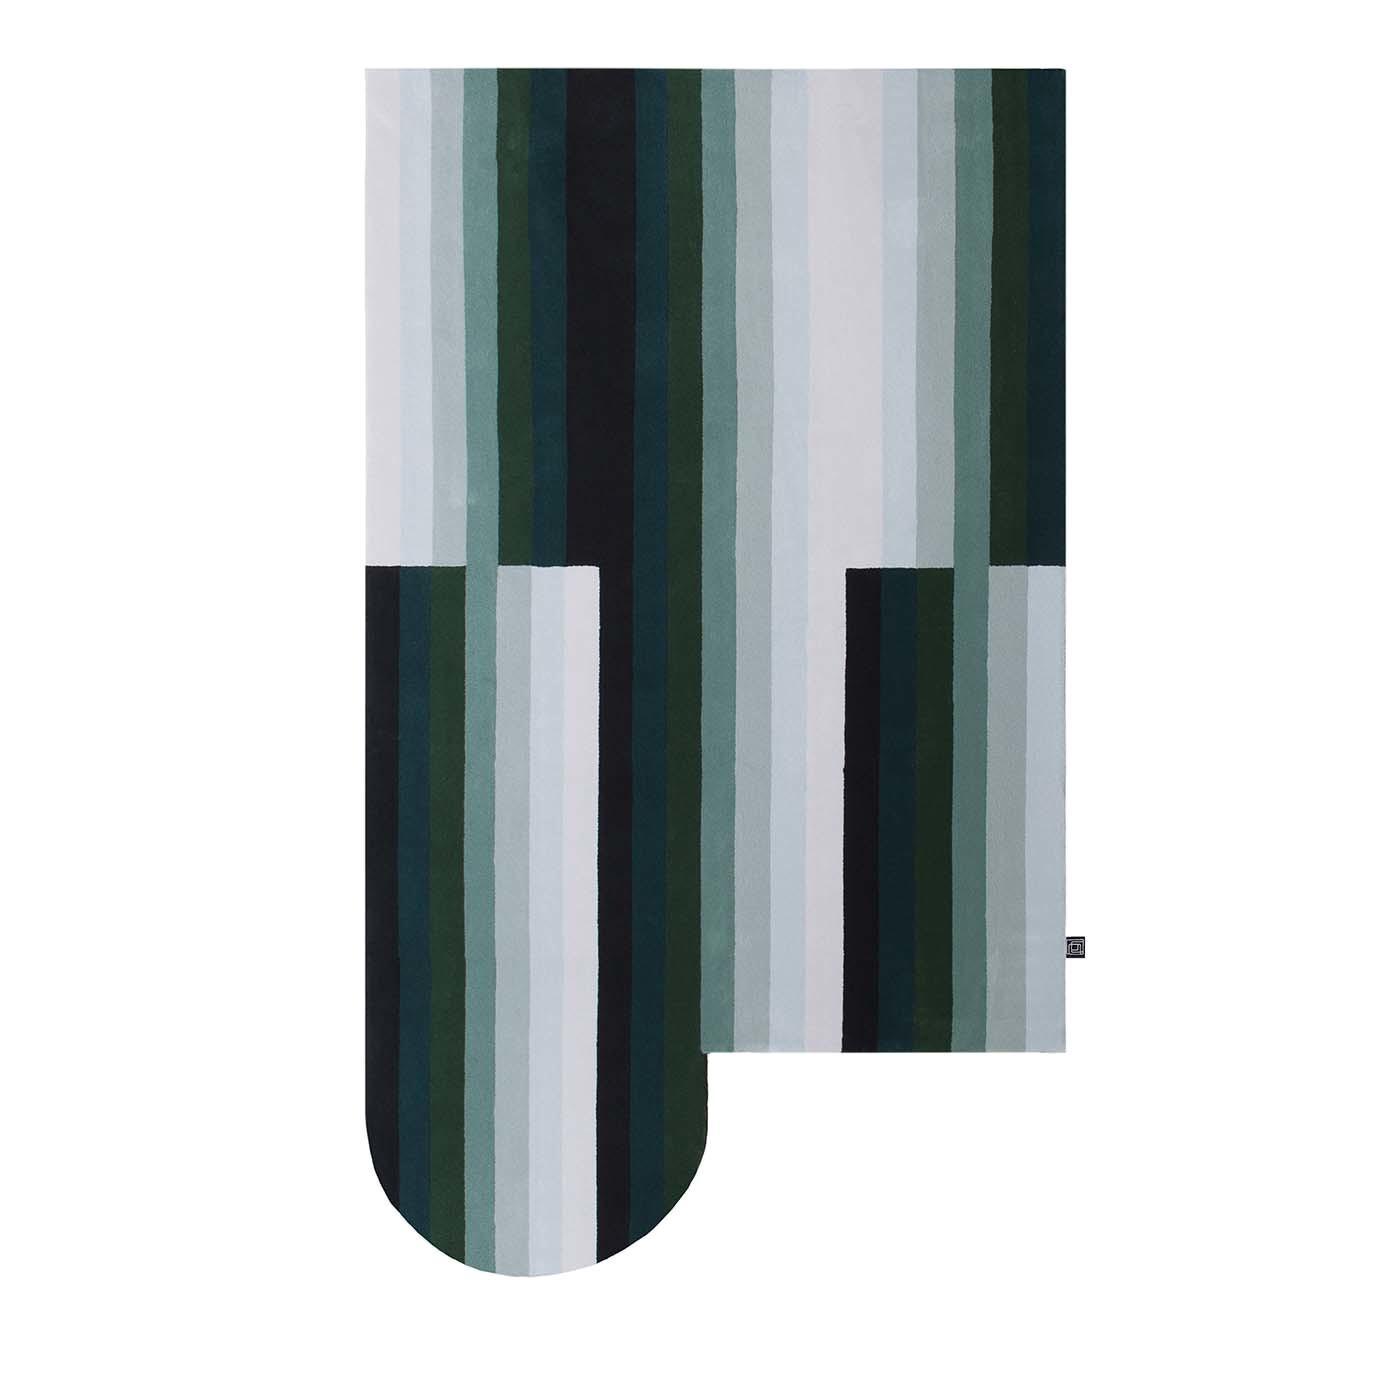 Evergreen Rug by Alquati+Corso